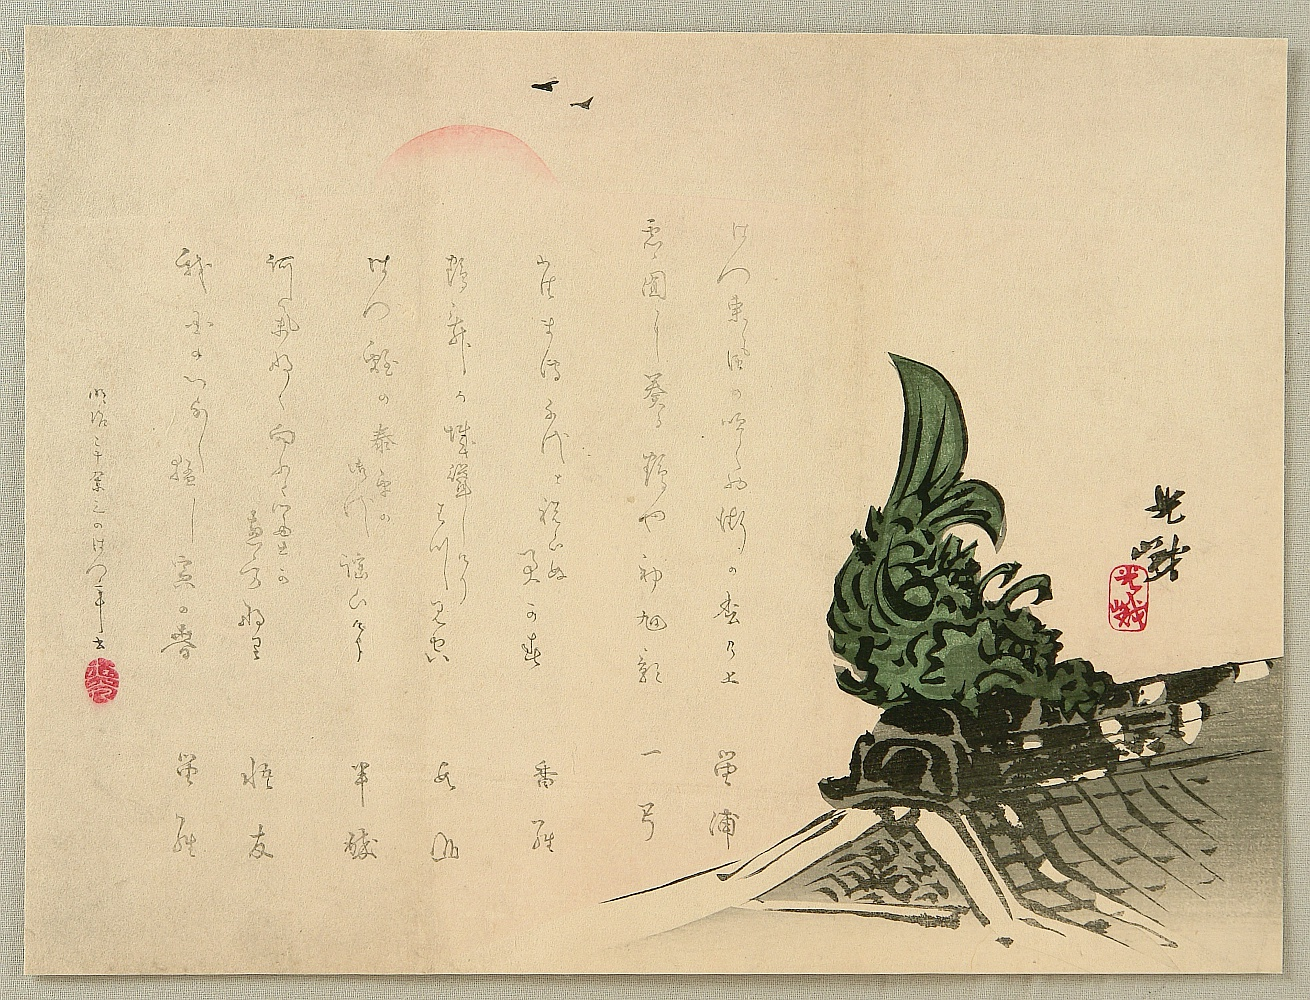 Iijima Koga47992g1.jpg